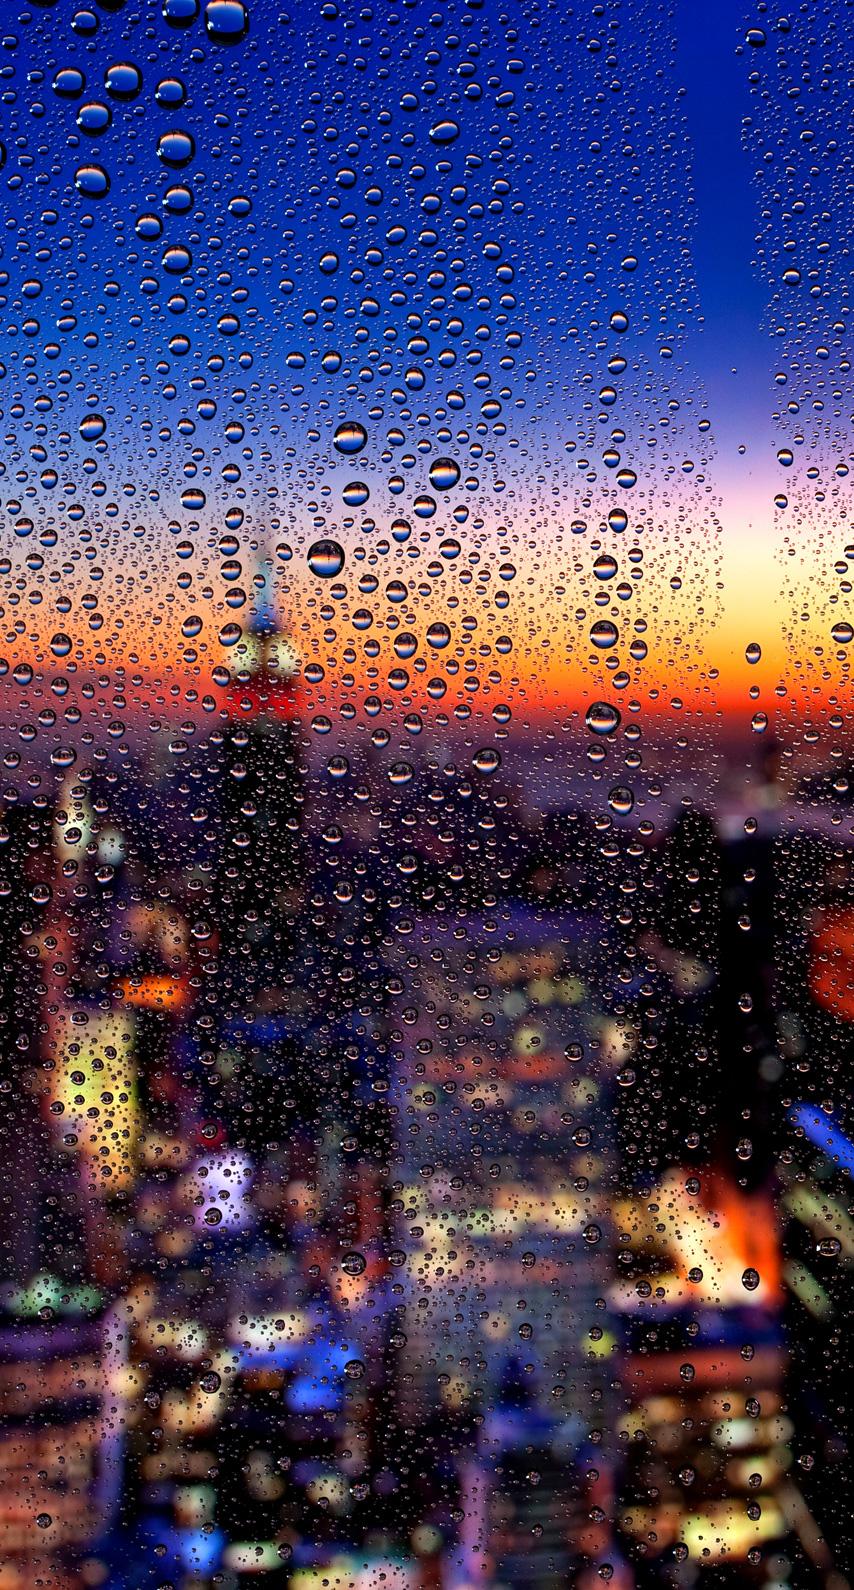 drops, raindrops, rooftops, window